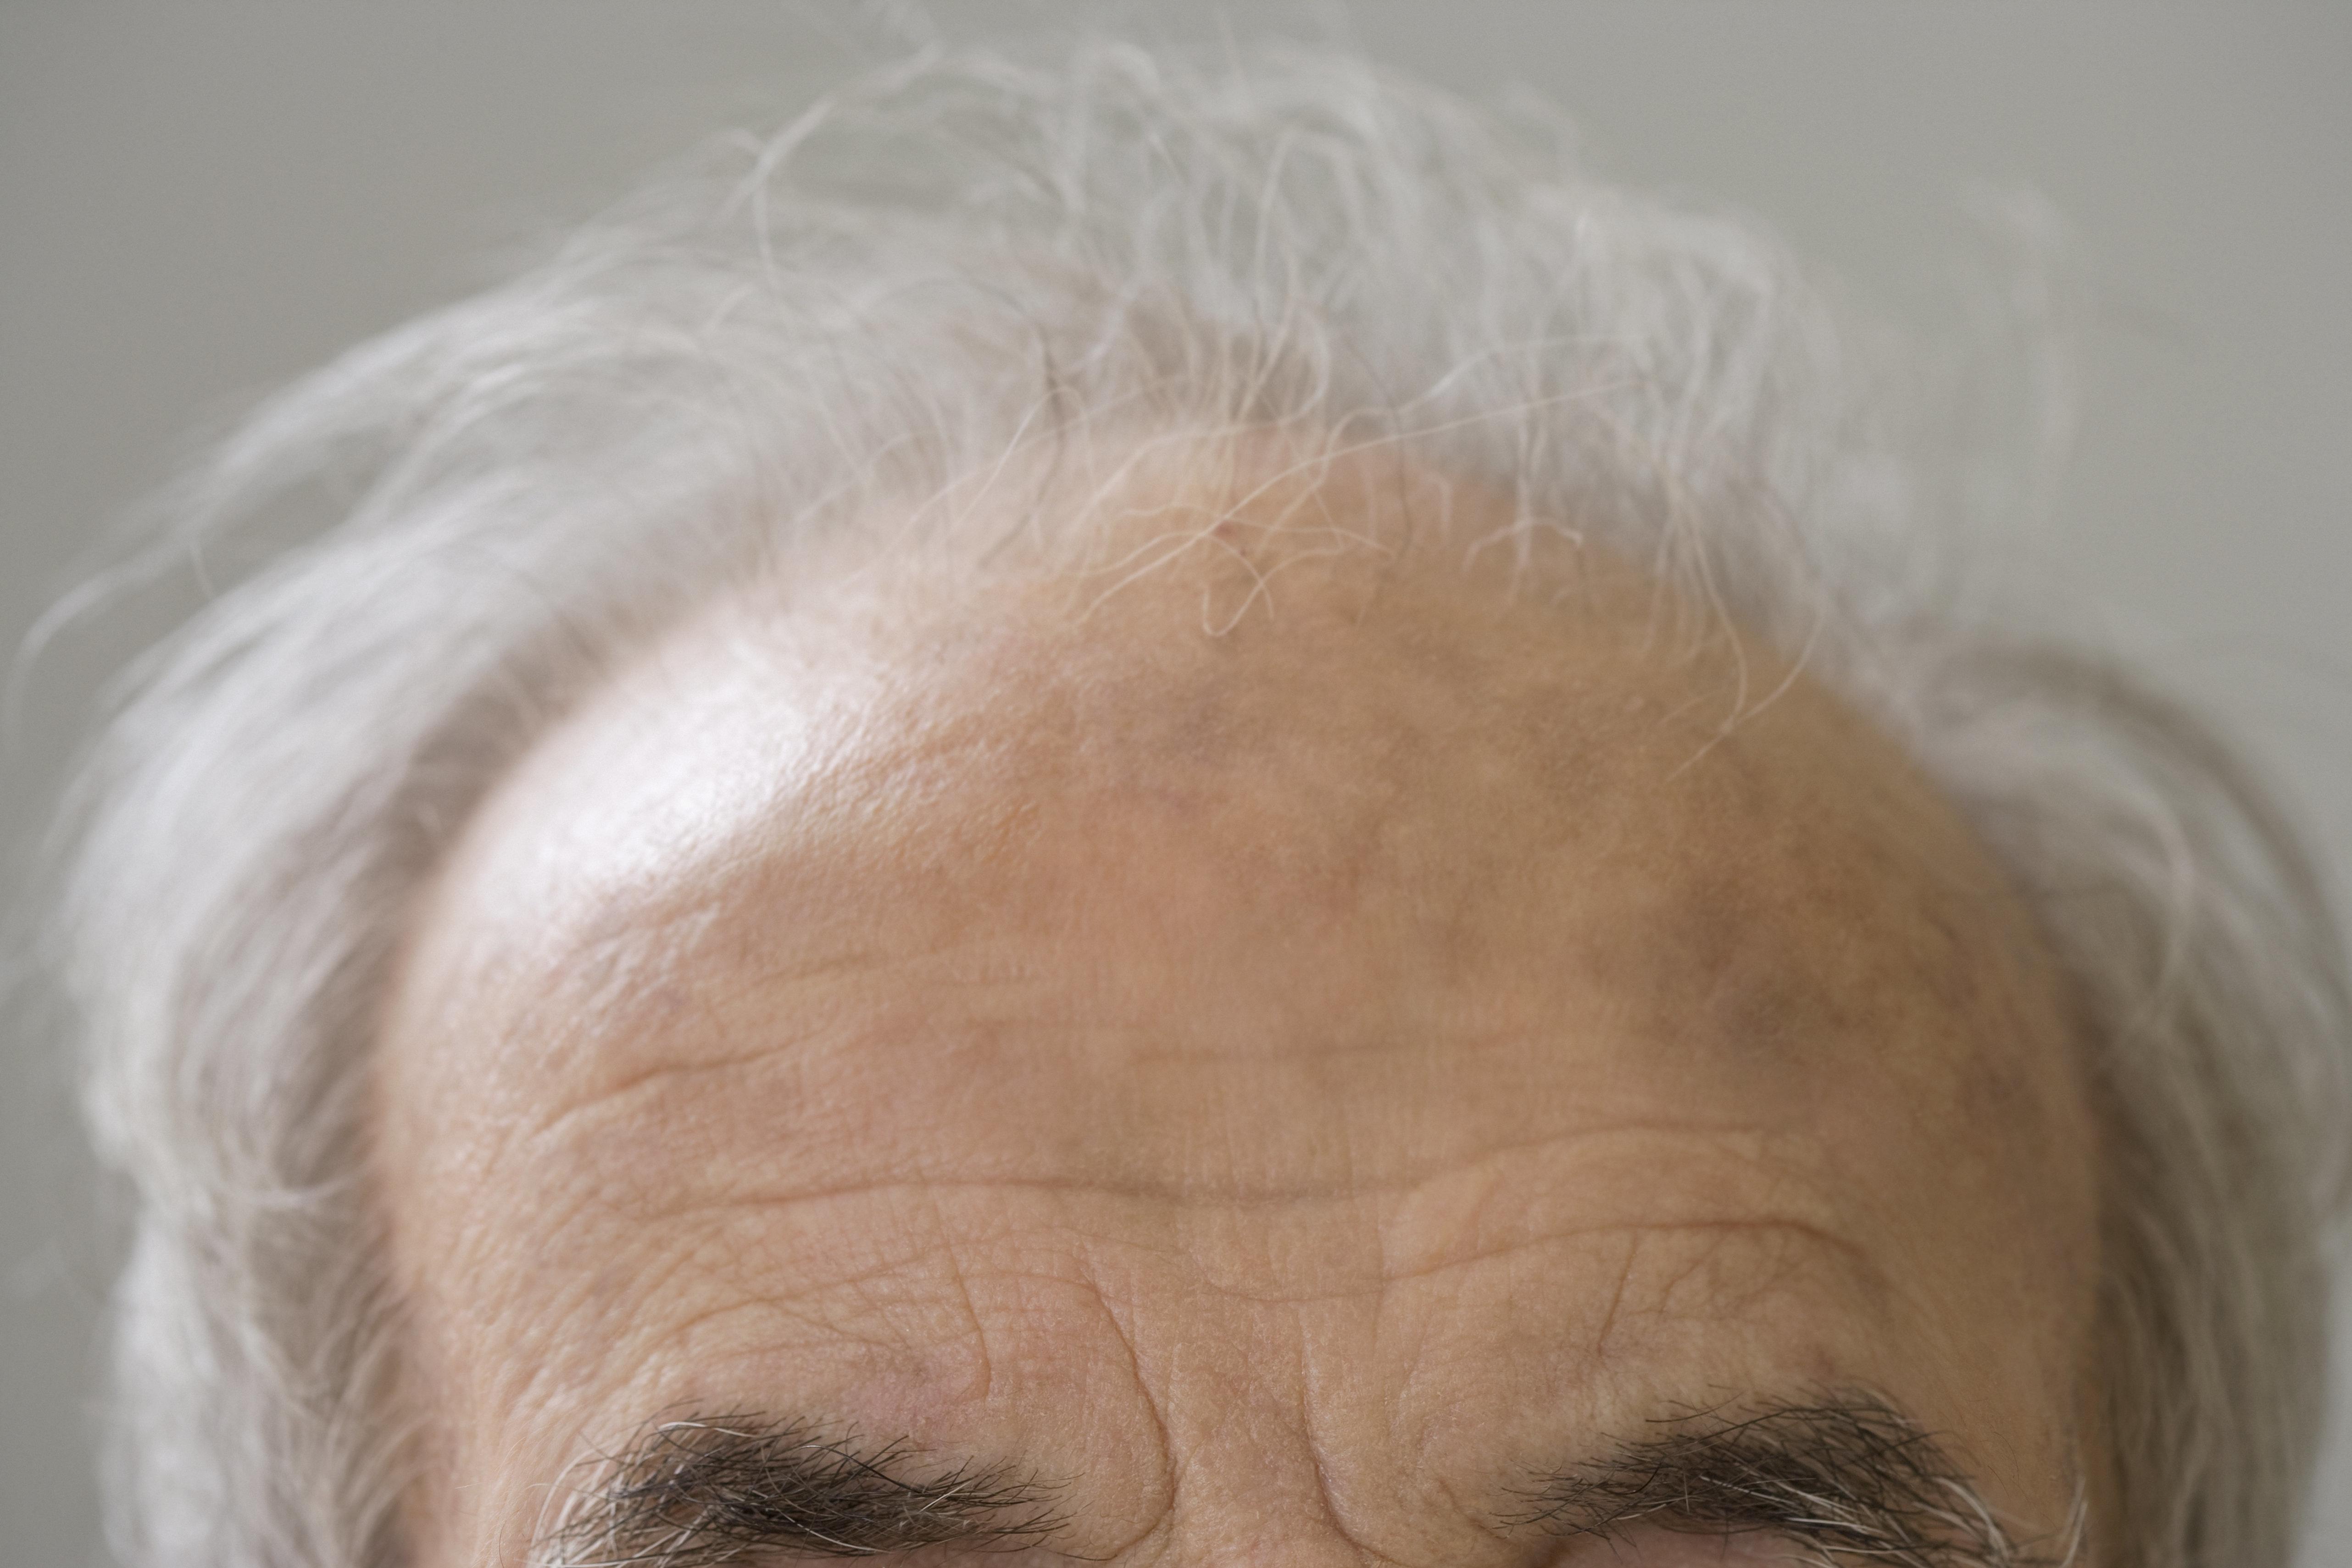 Close up of senior Hispanic man¿s balding head